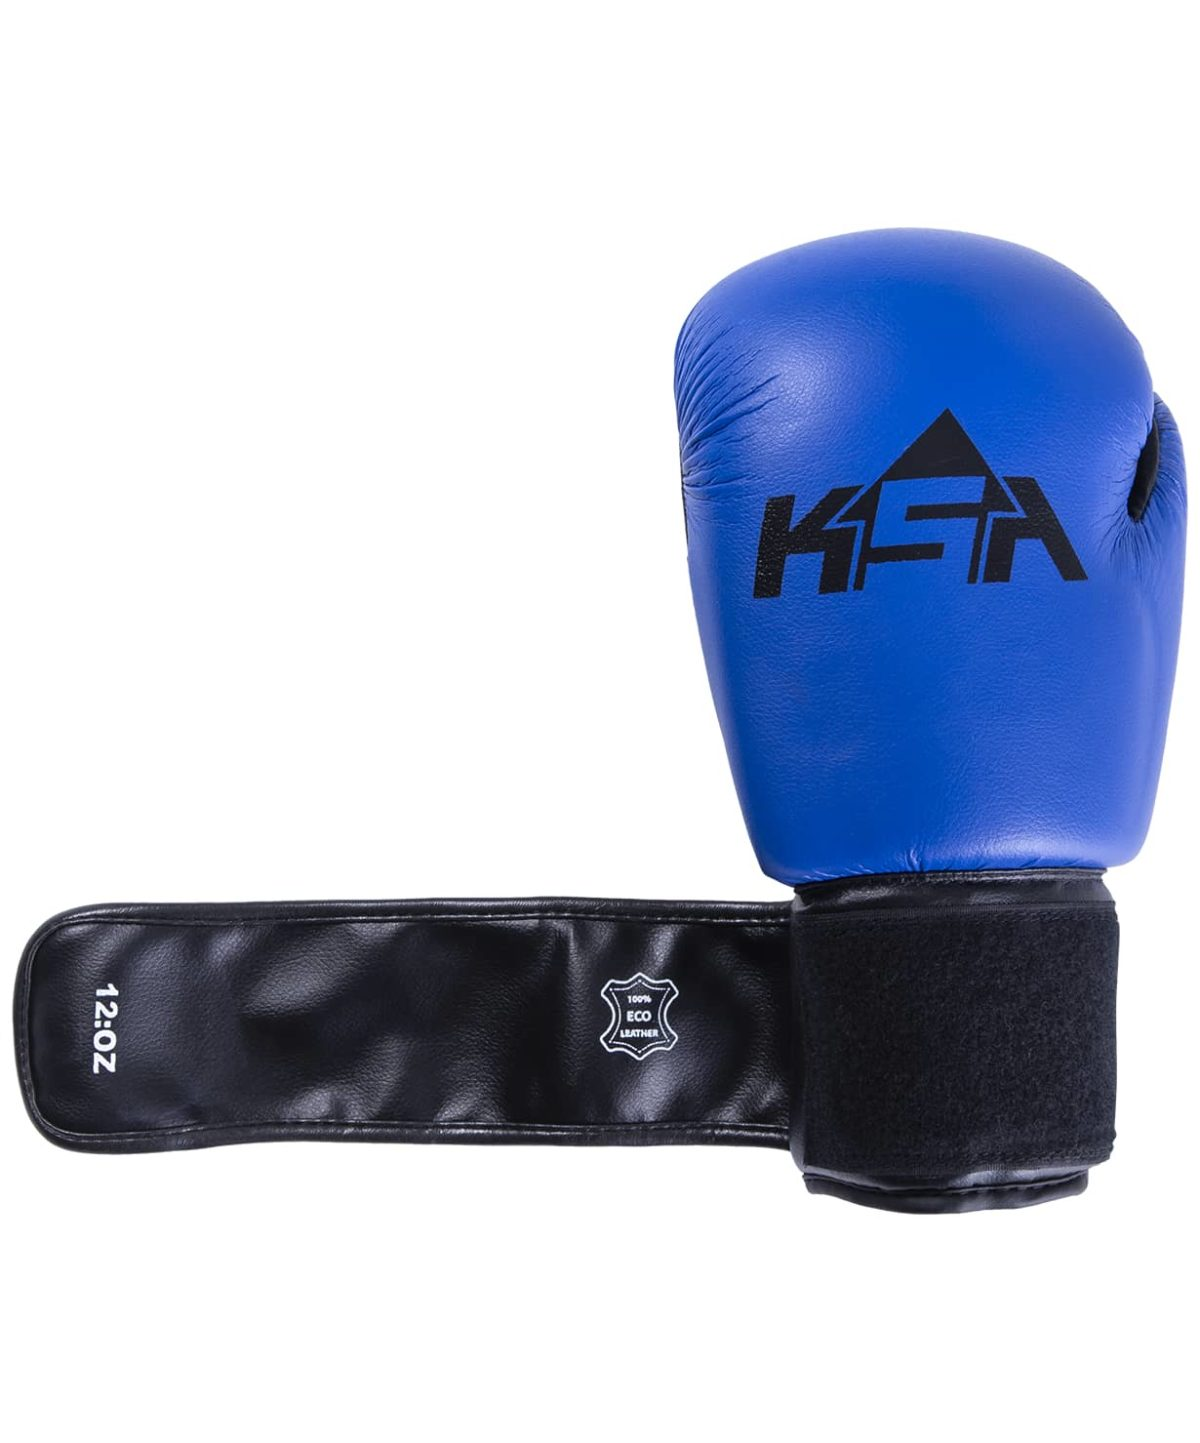 KSA Spider Blue Перчатки боксерские, 8 oz, к/з 17805 - 2